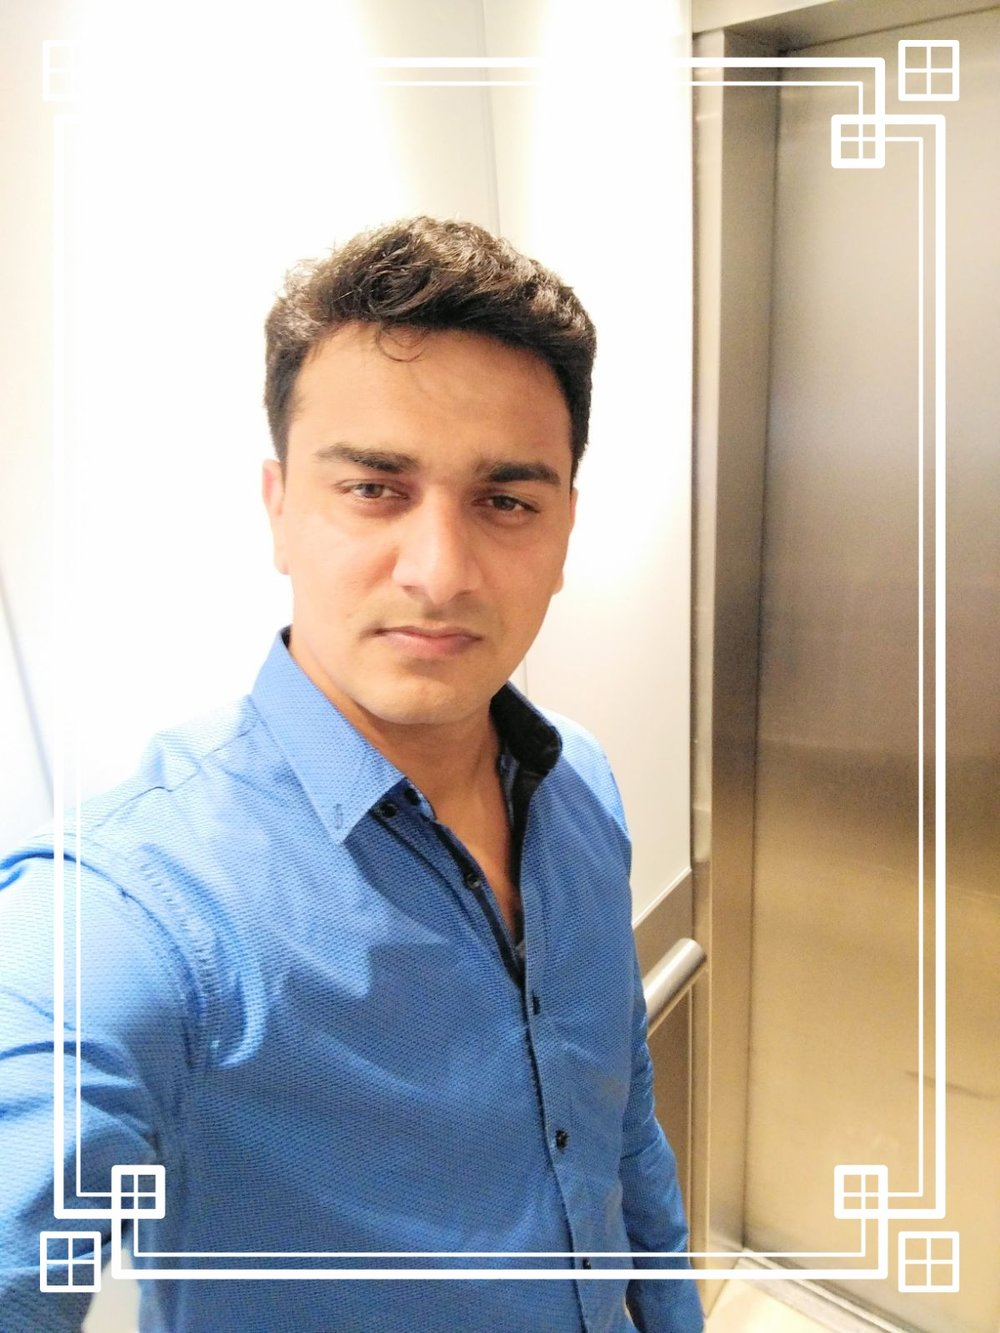 Arun Malik Umra - Founder and Developer